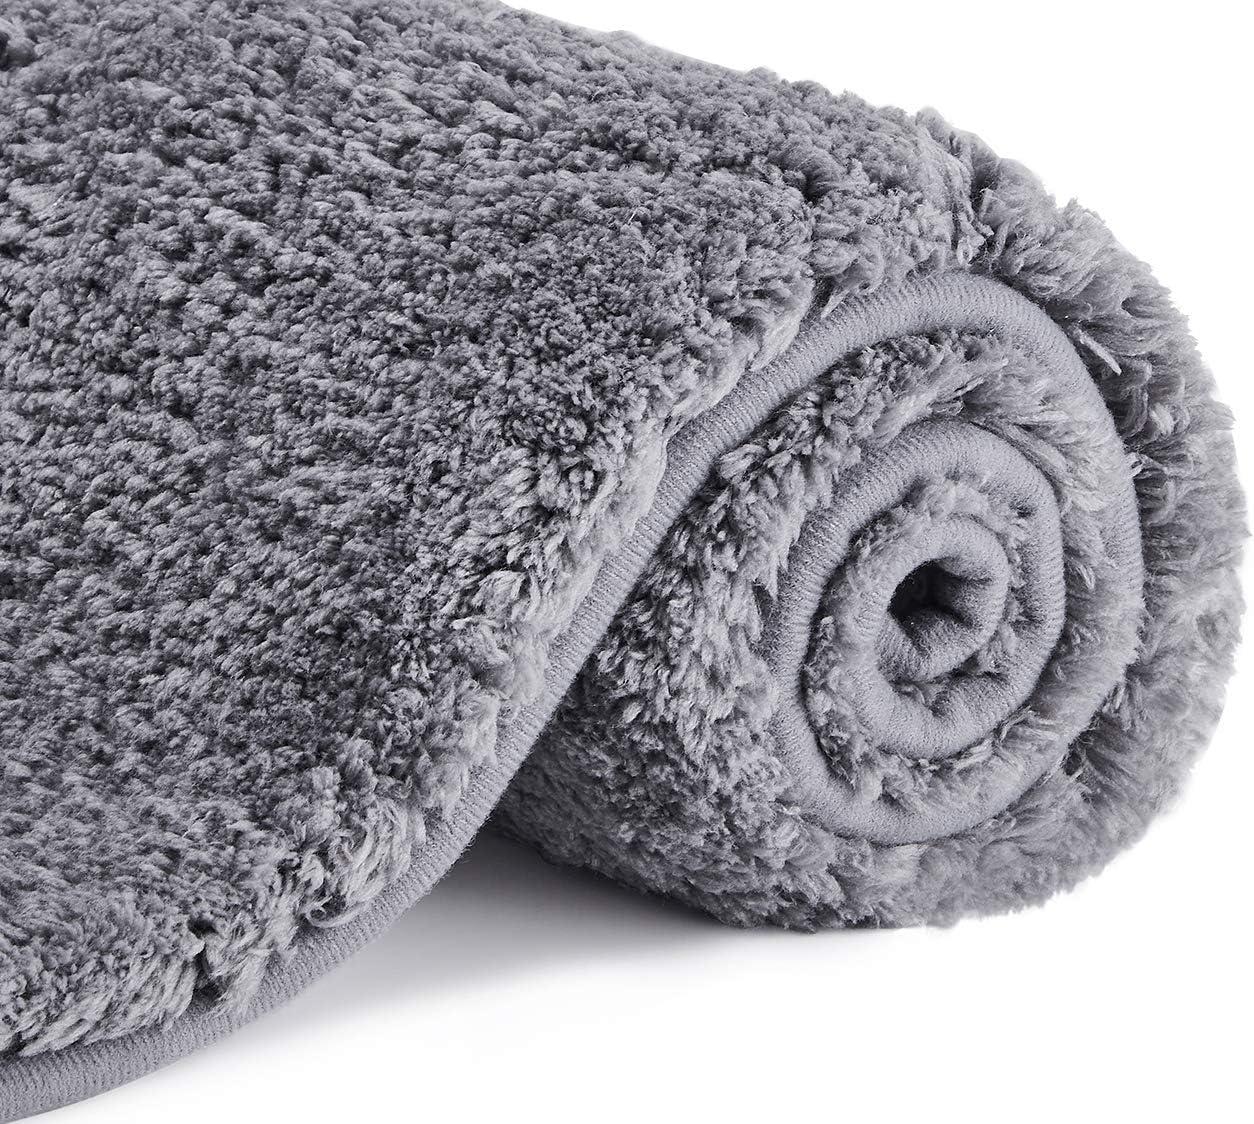 Dark Grey Absorbent Bathroom Floor Mats Washable defway Non Slip Bath Mat Large Thick Bath Mats Soft Shaggy Bath Mats for Bathroom 80 * 50cm